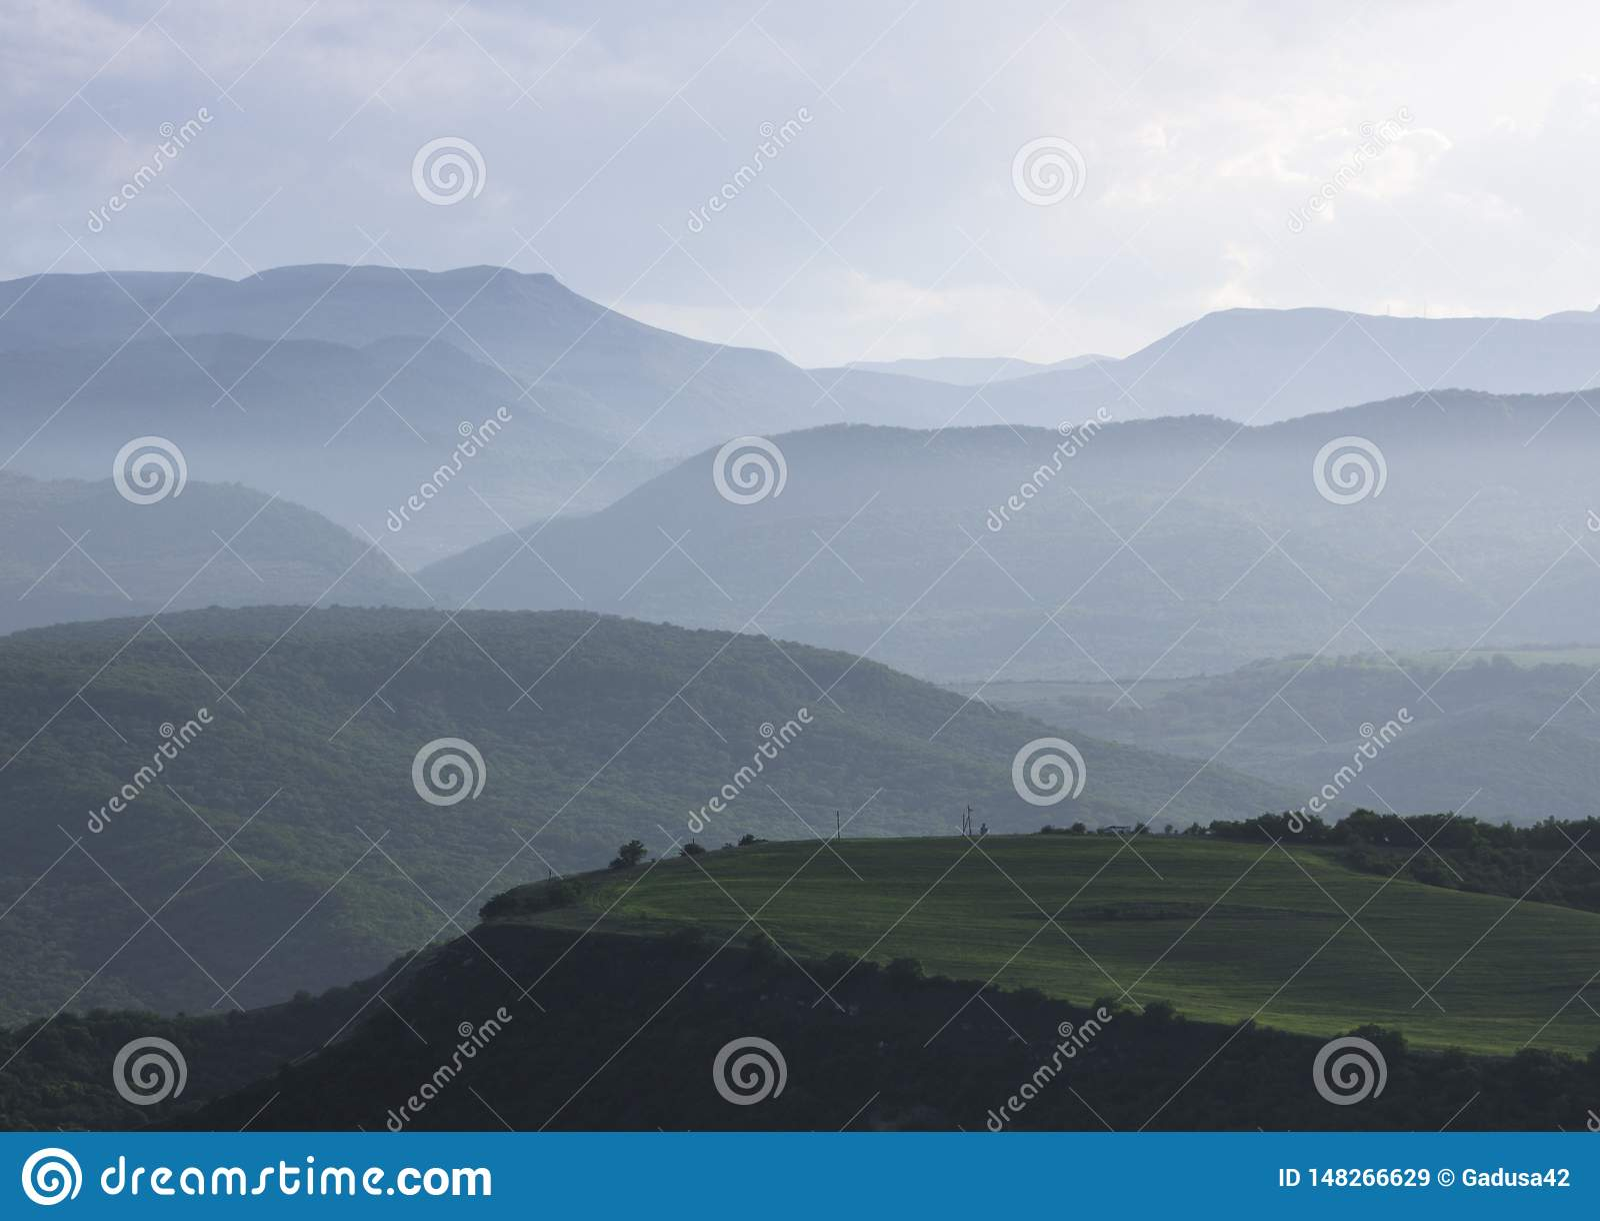 Dimmigt liggandeberg ryss f?r ossetia f?r berg f?r alaniacaucasus federation nordlig